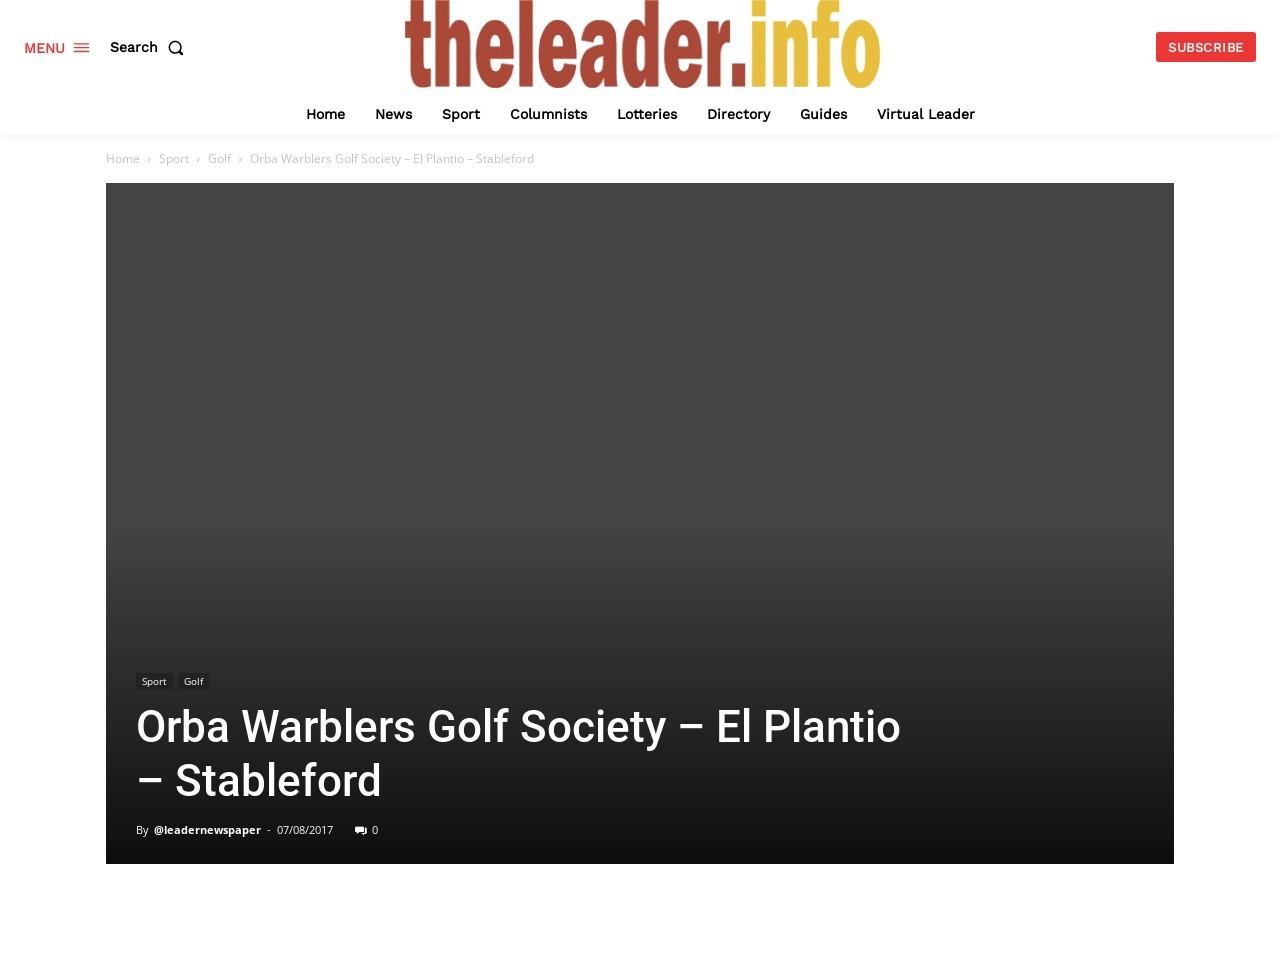 Orba Warblers Golf Society –El Plantio – Stableford